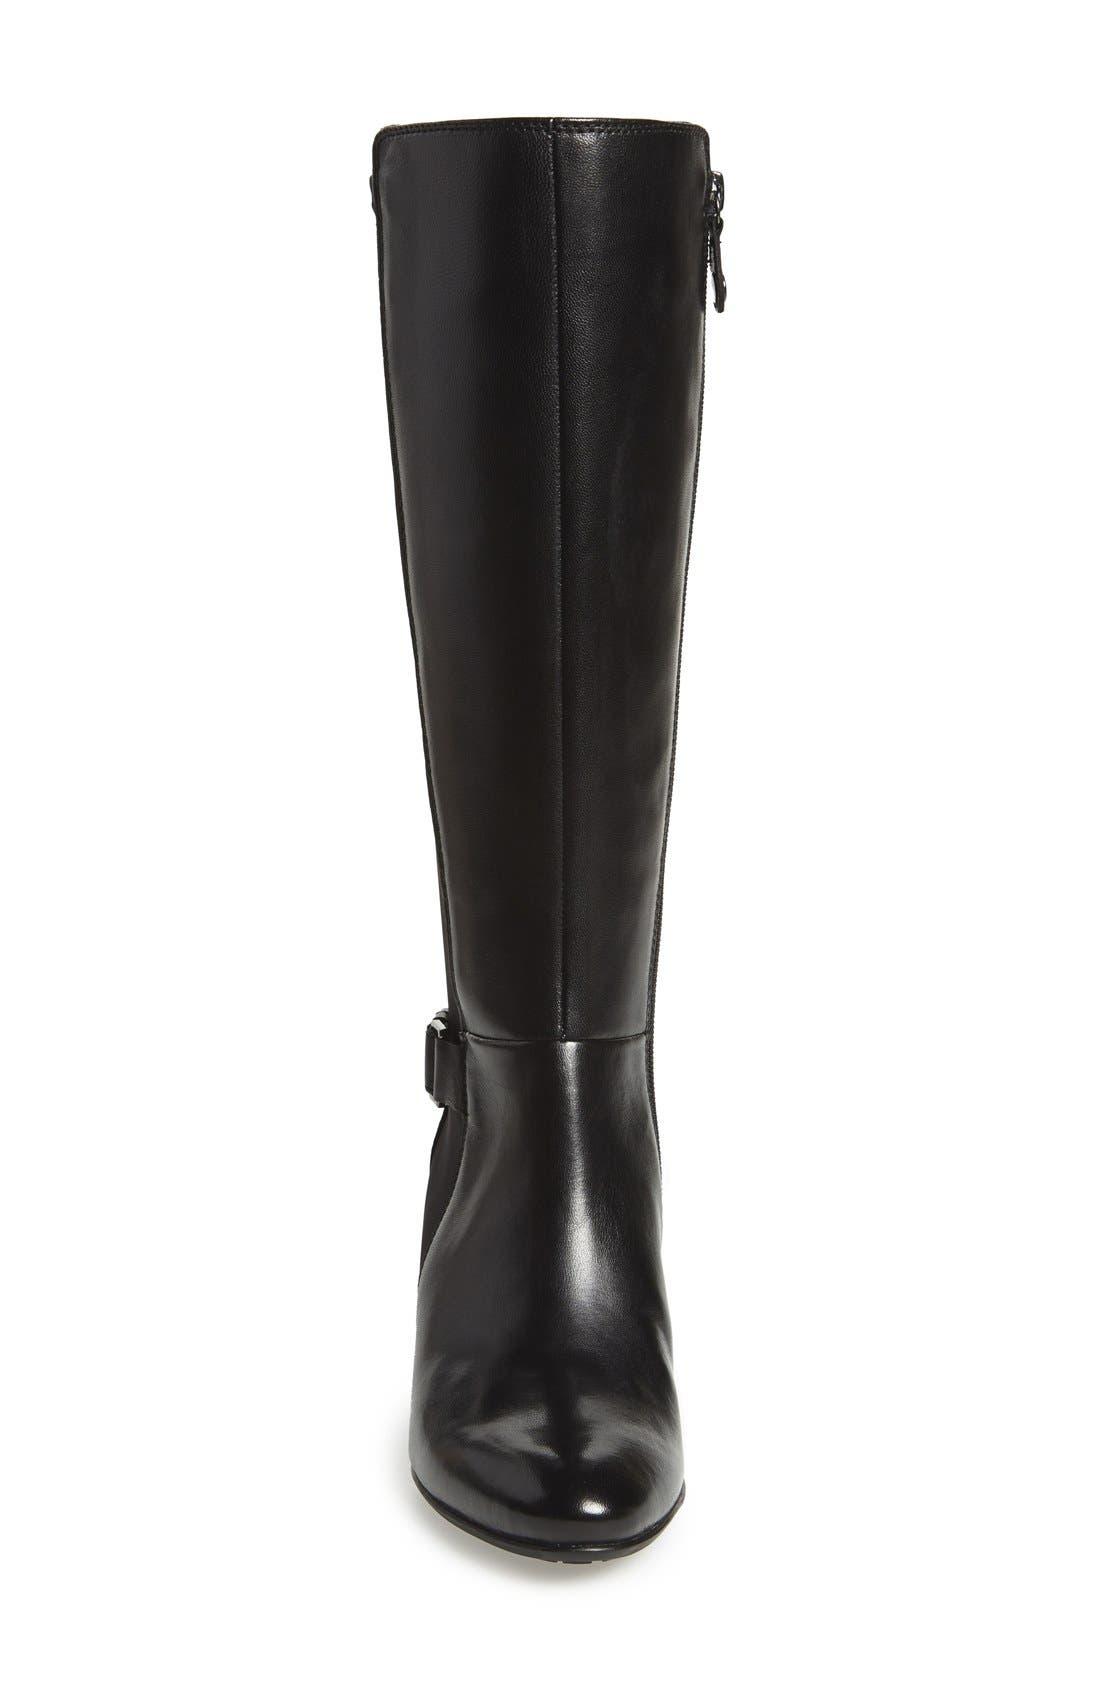 Alternate Image 3  - Geox'Venere' Tall Wedge Boot (Women)